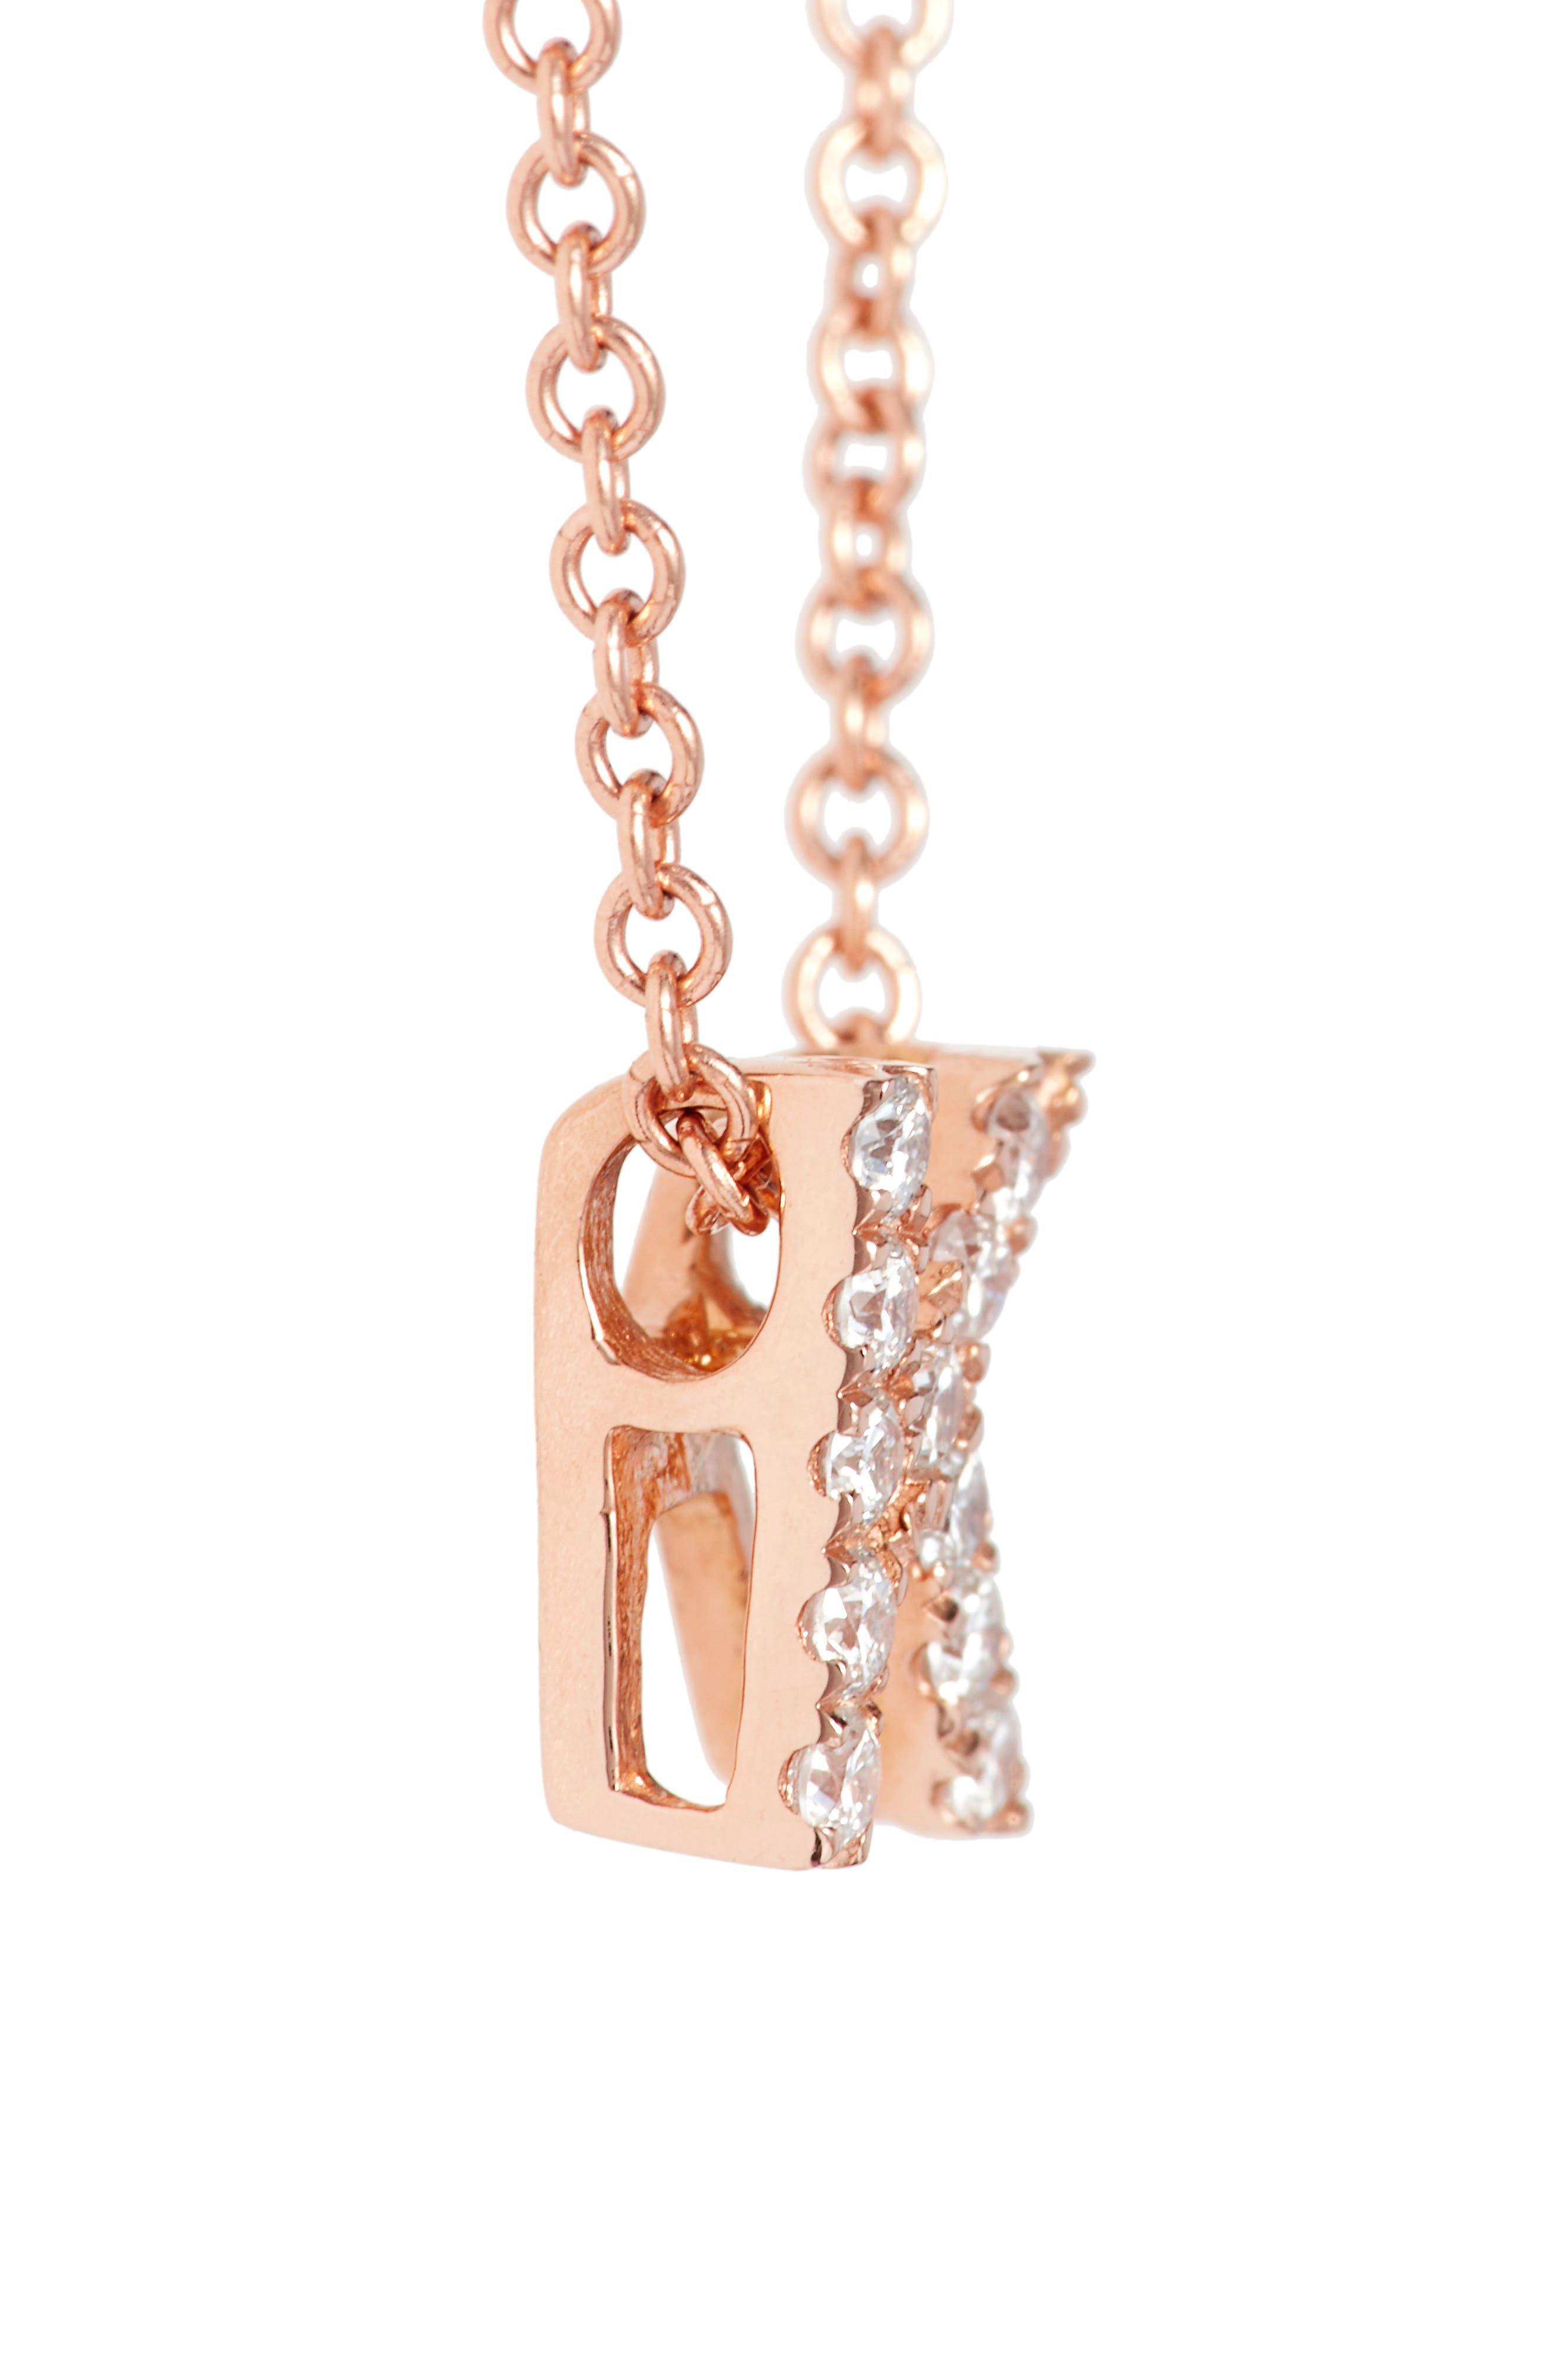 18k Gold Pavé Diamond Initial Pendant Necklace,                             Alternate thumbnail 3, color,                             Rose Gold - K